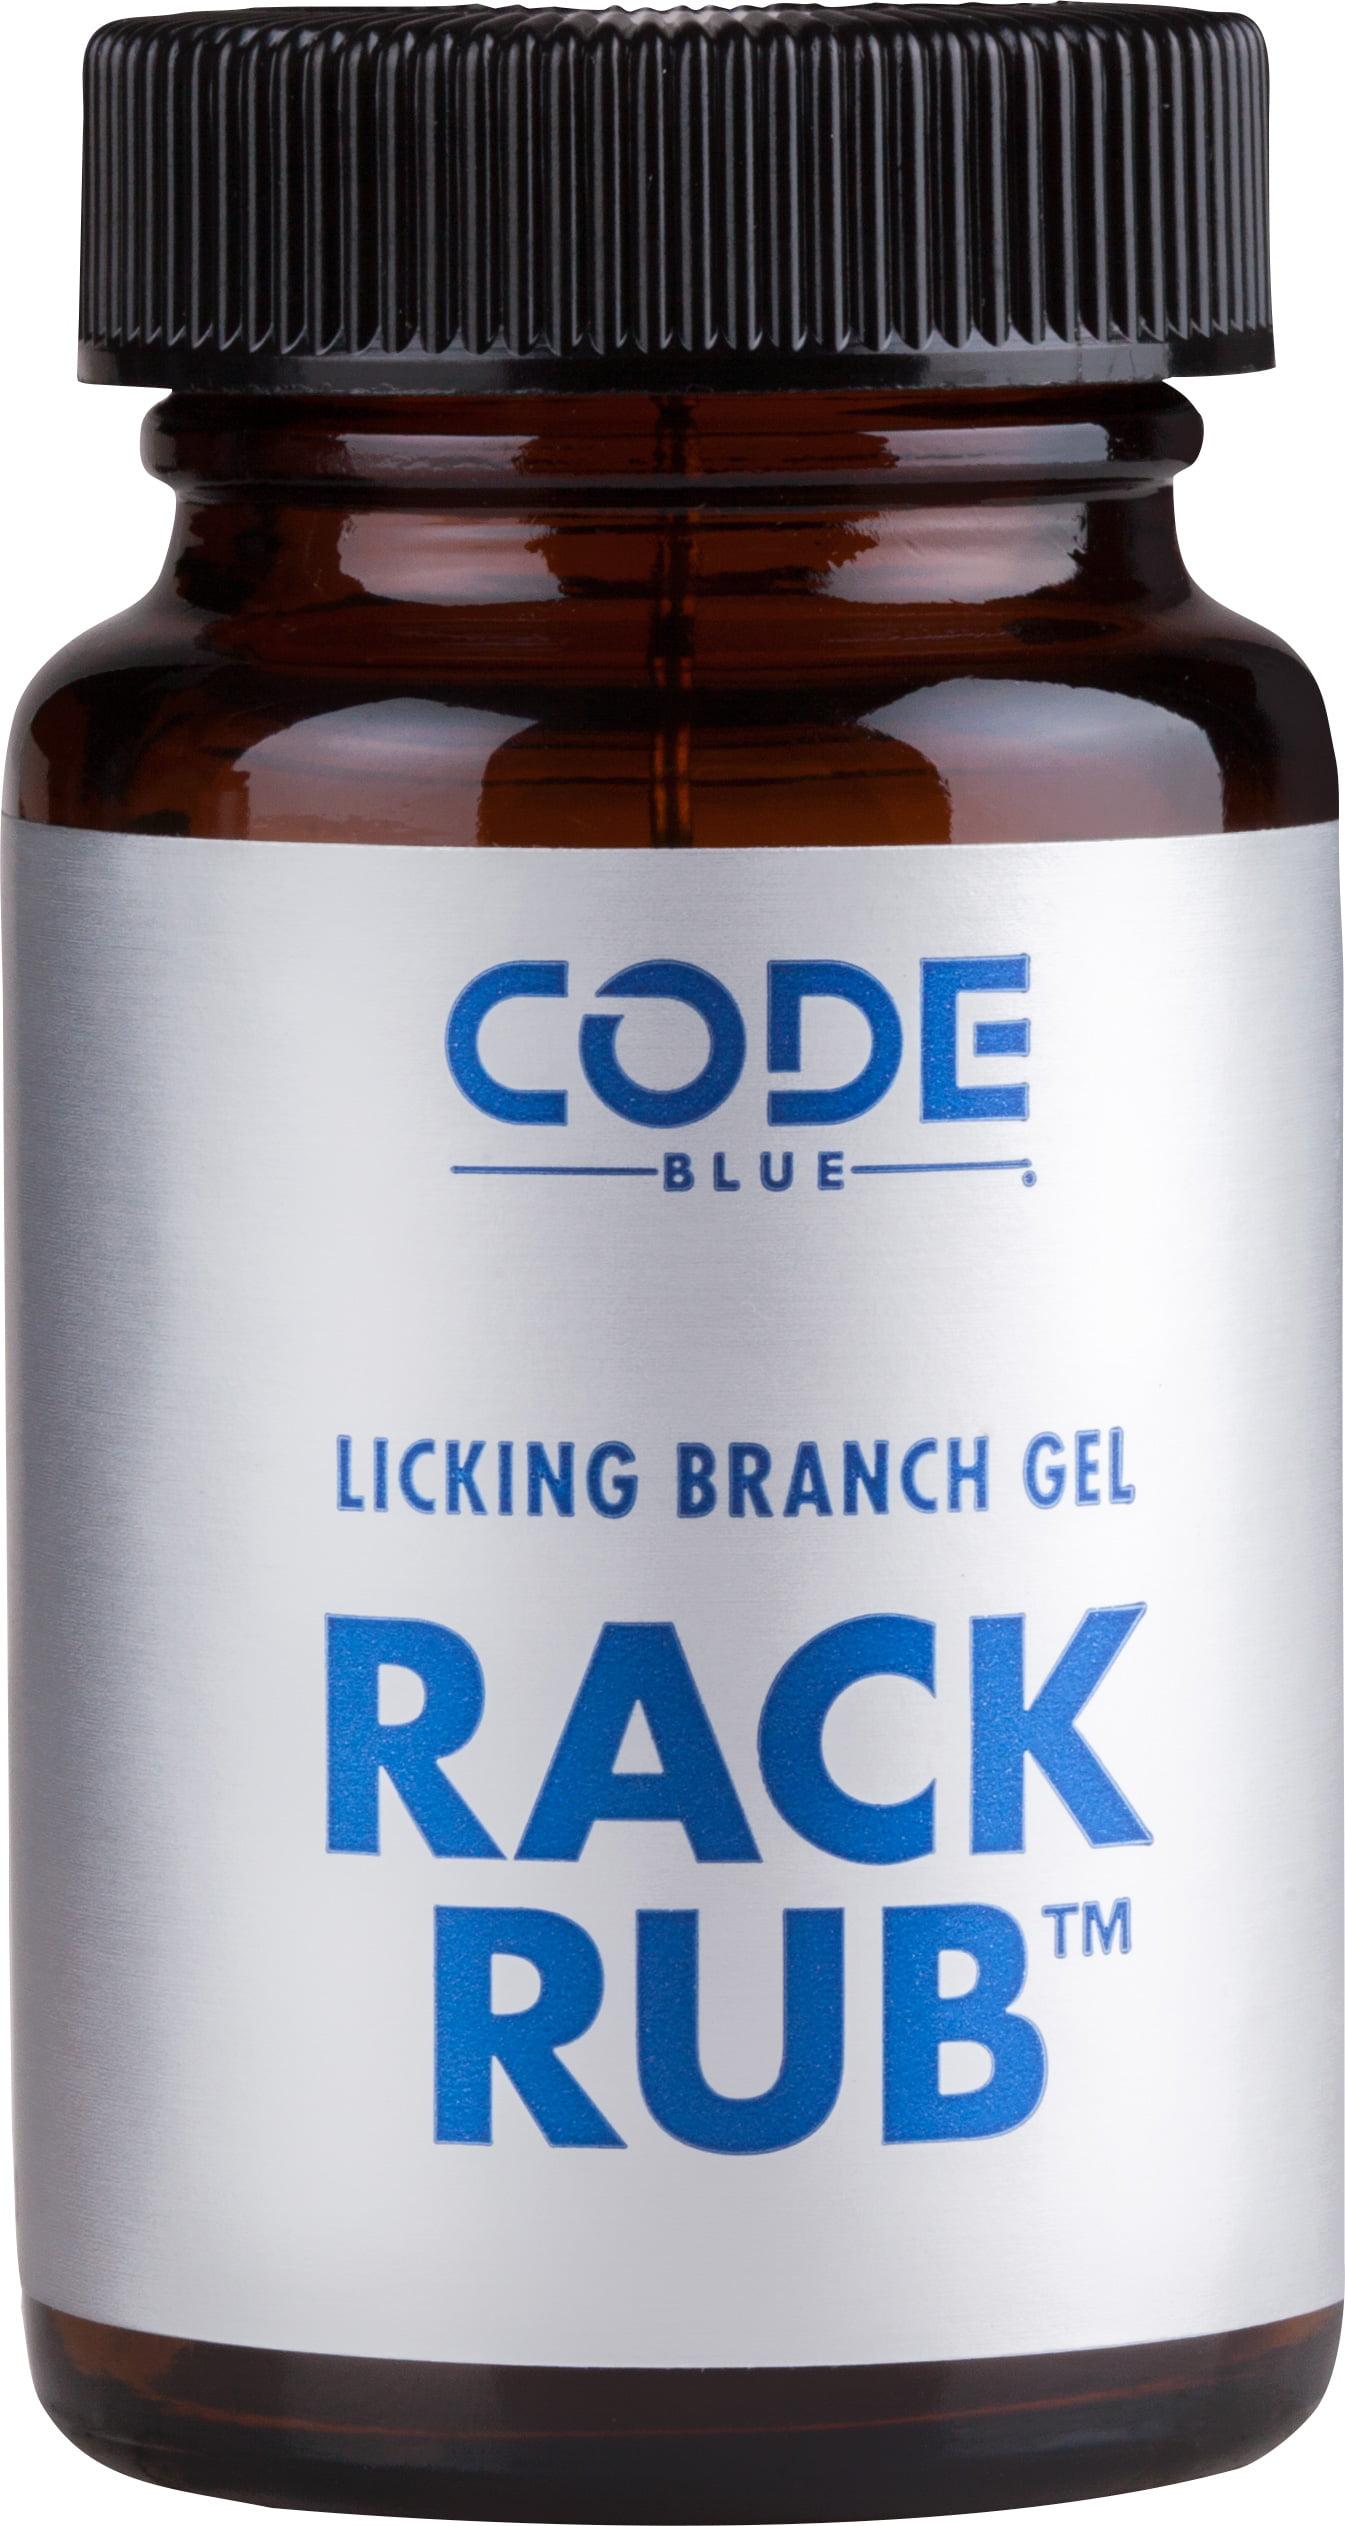 Code Blue Rack Rub Gel, 2 oz by Code Blue